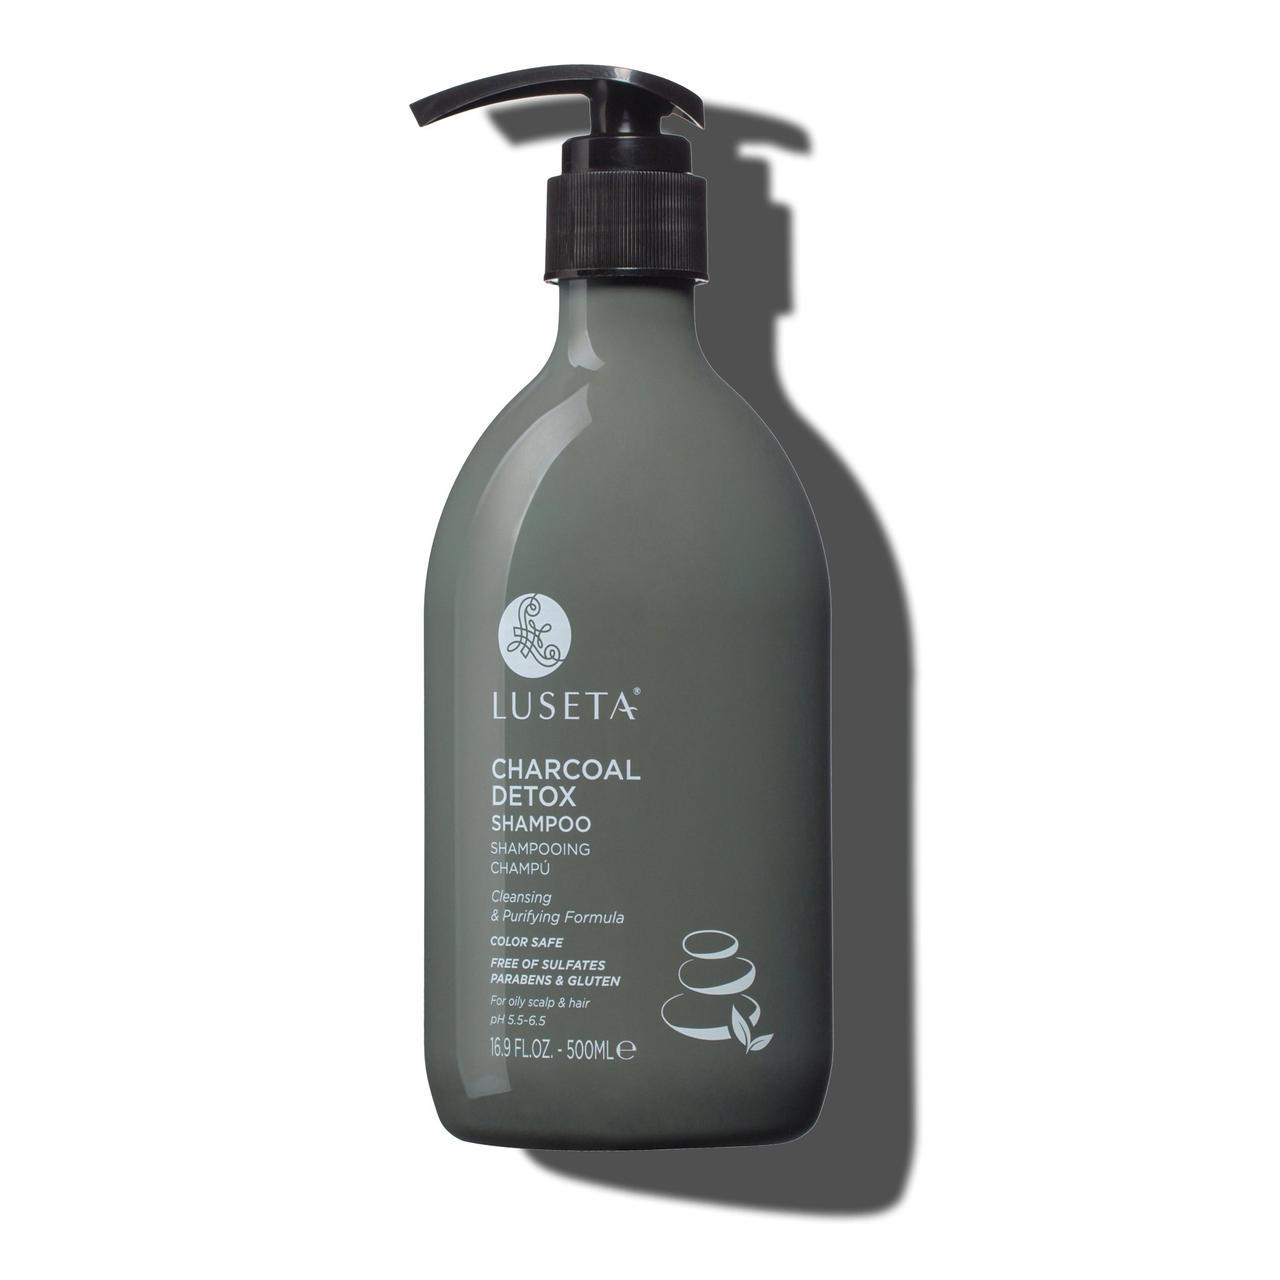 Шампунь для жирных волос Luseta Charcoal Detox Shampoo 500ml